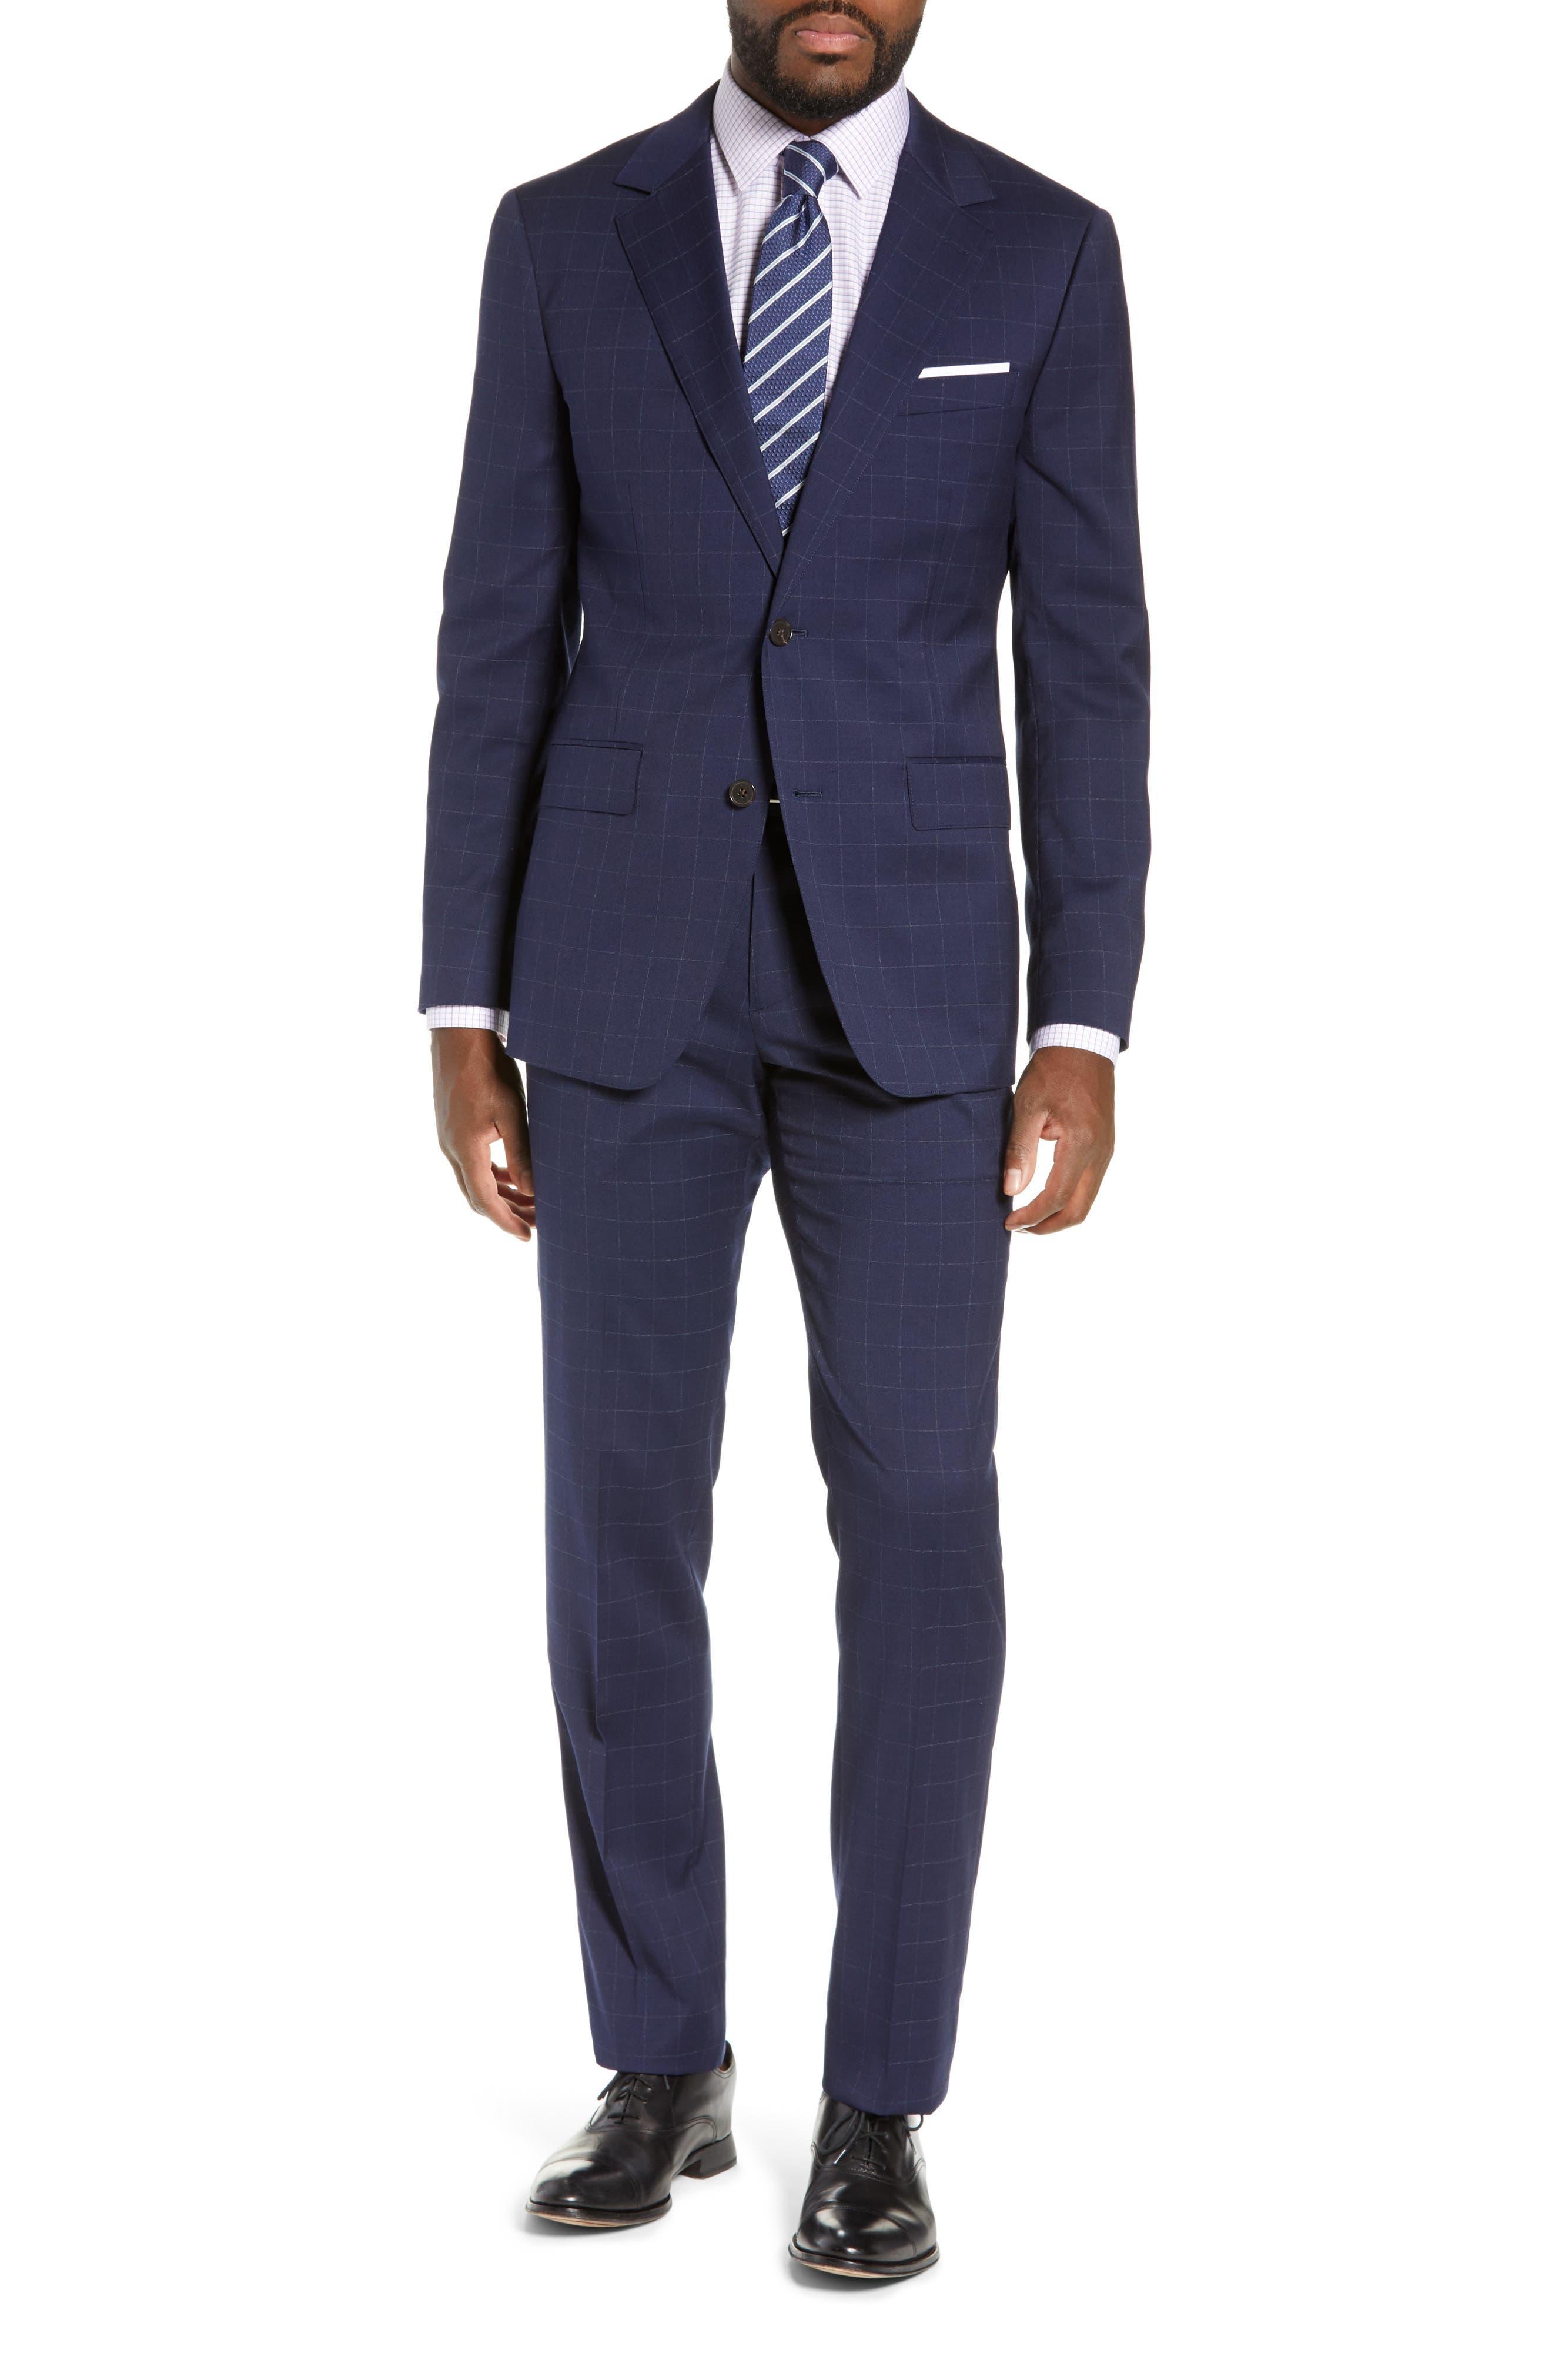 BONOBOS, Jetsetter Slim Fit Stretch Suit Pants, Alternate thumbnail 7, color, NAVY CHALK WINDOWPANE